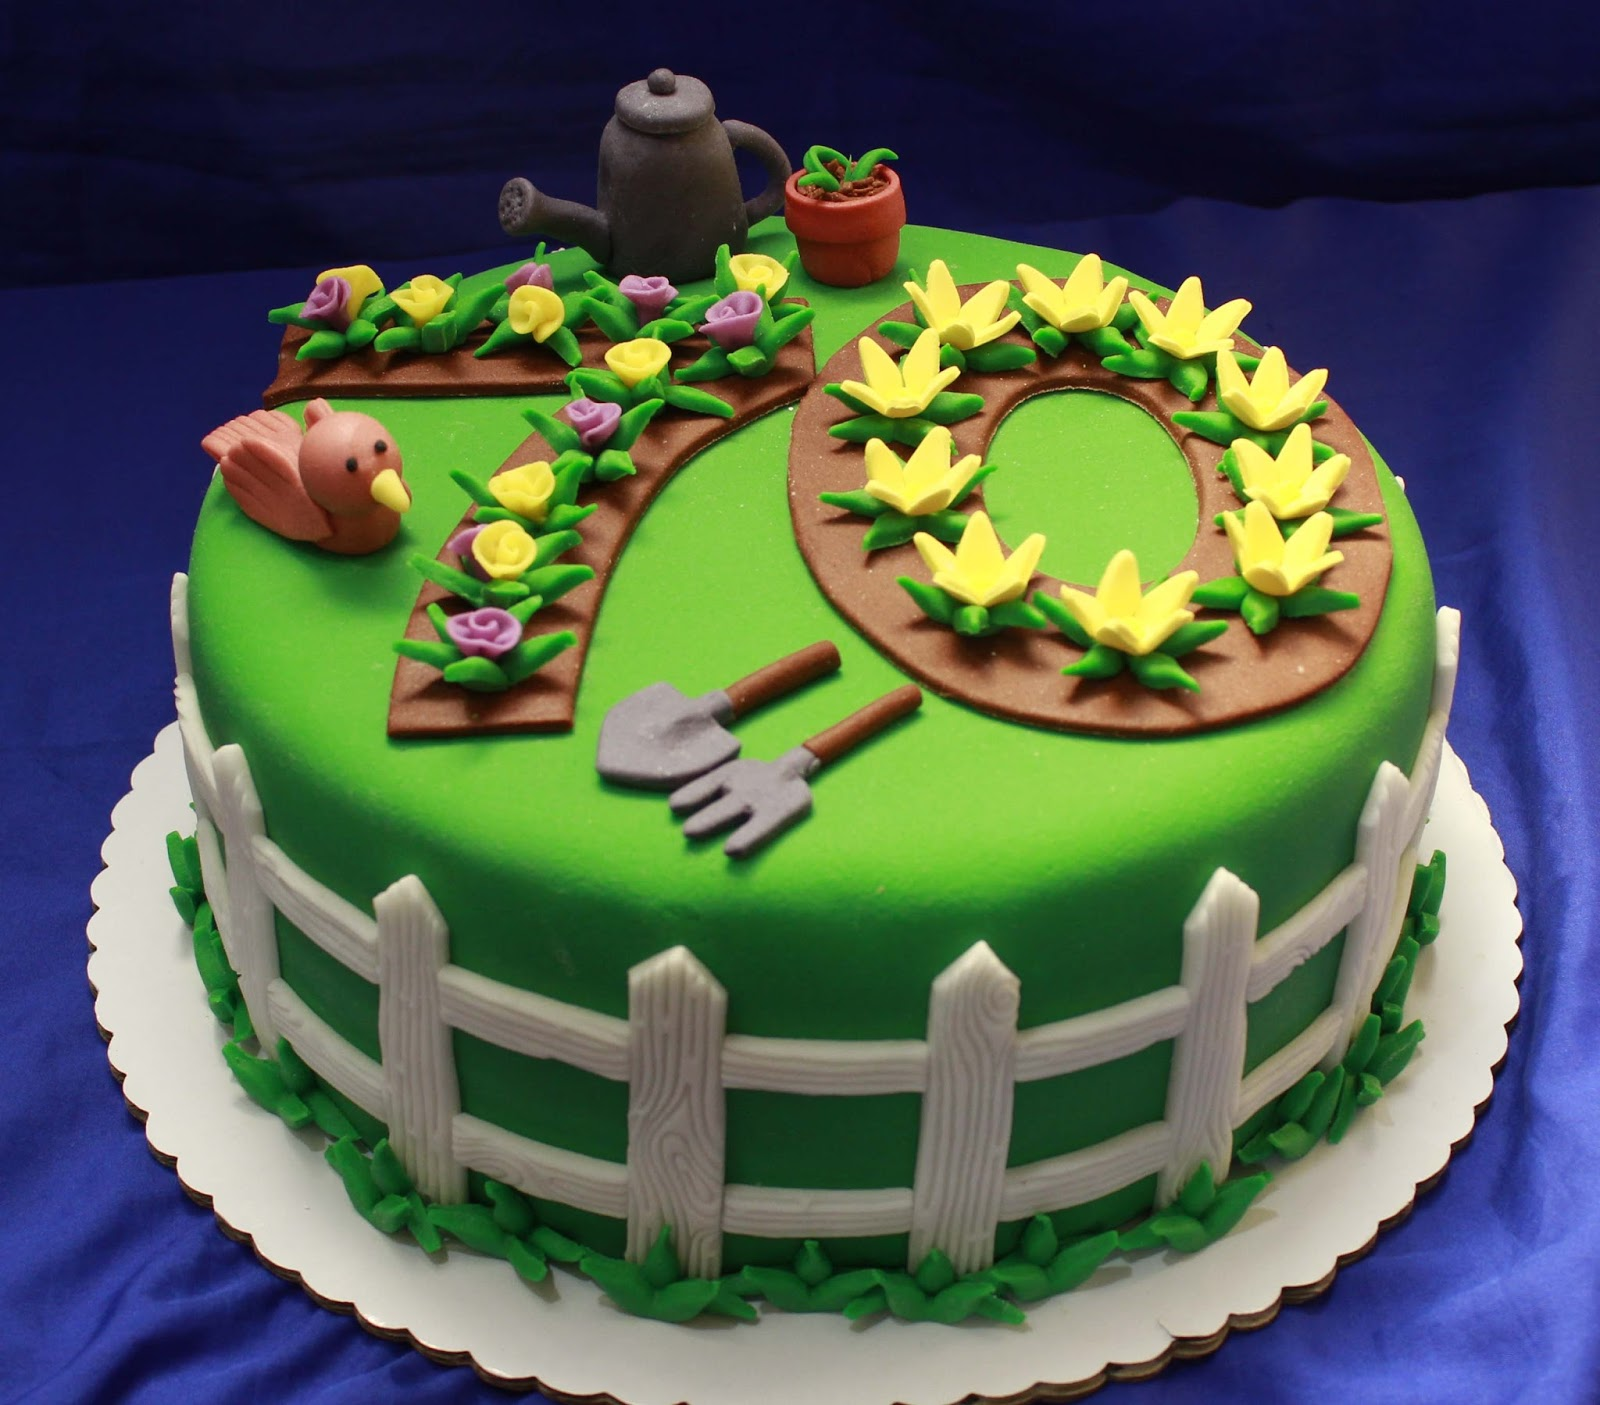 Shebz Cakes Cebu 2016